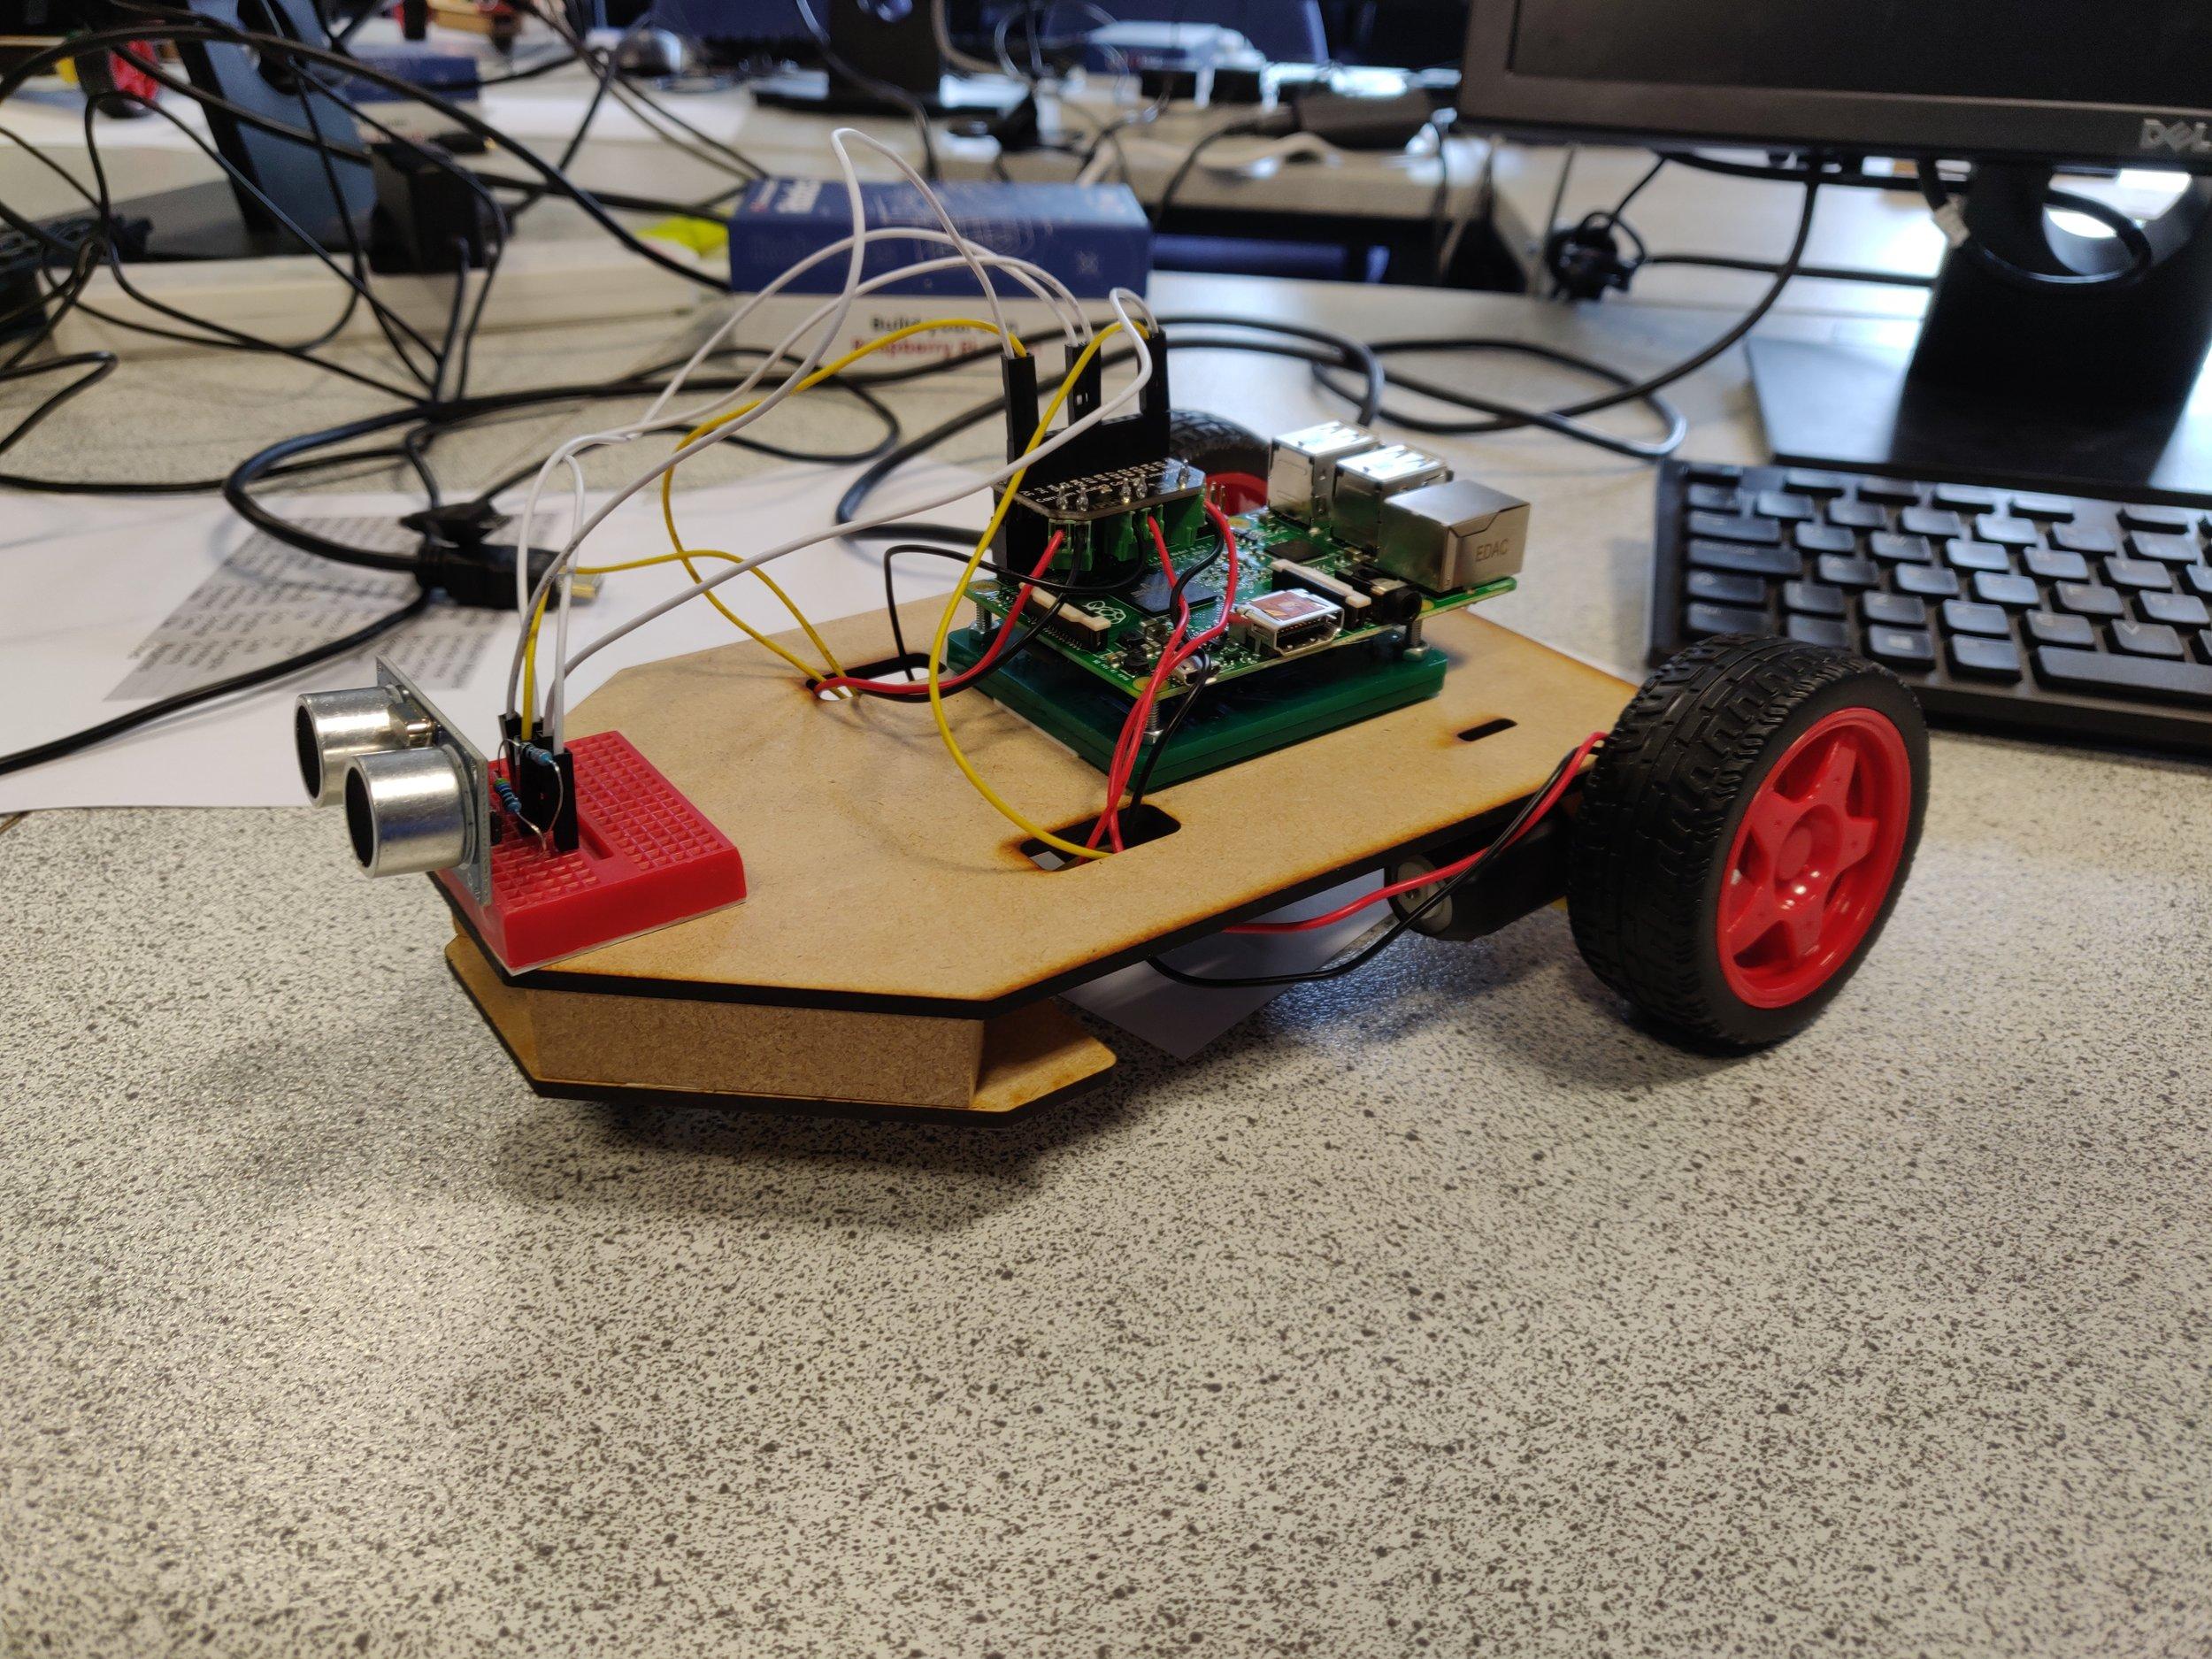 robotics course7.jpg